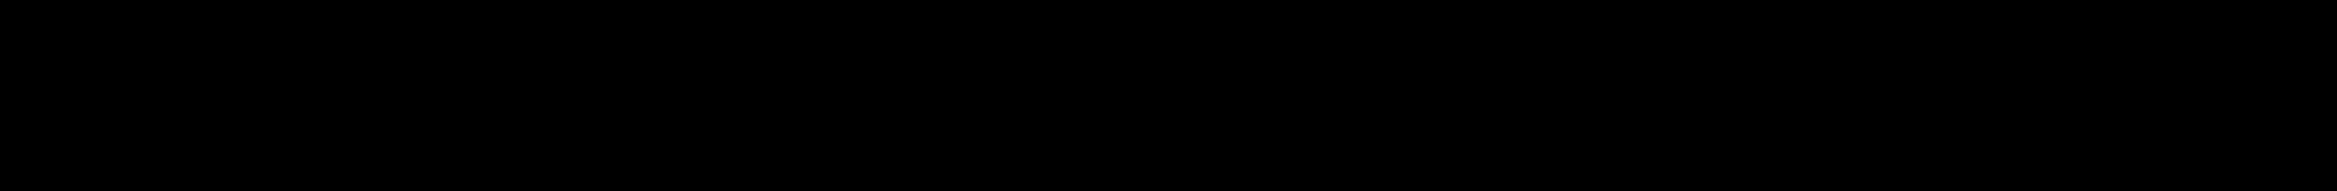 Psychatronic Bold Oblique